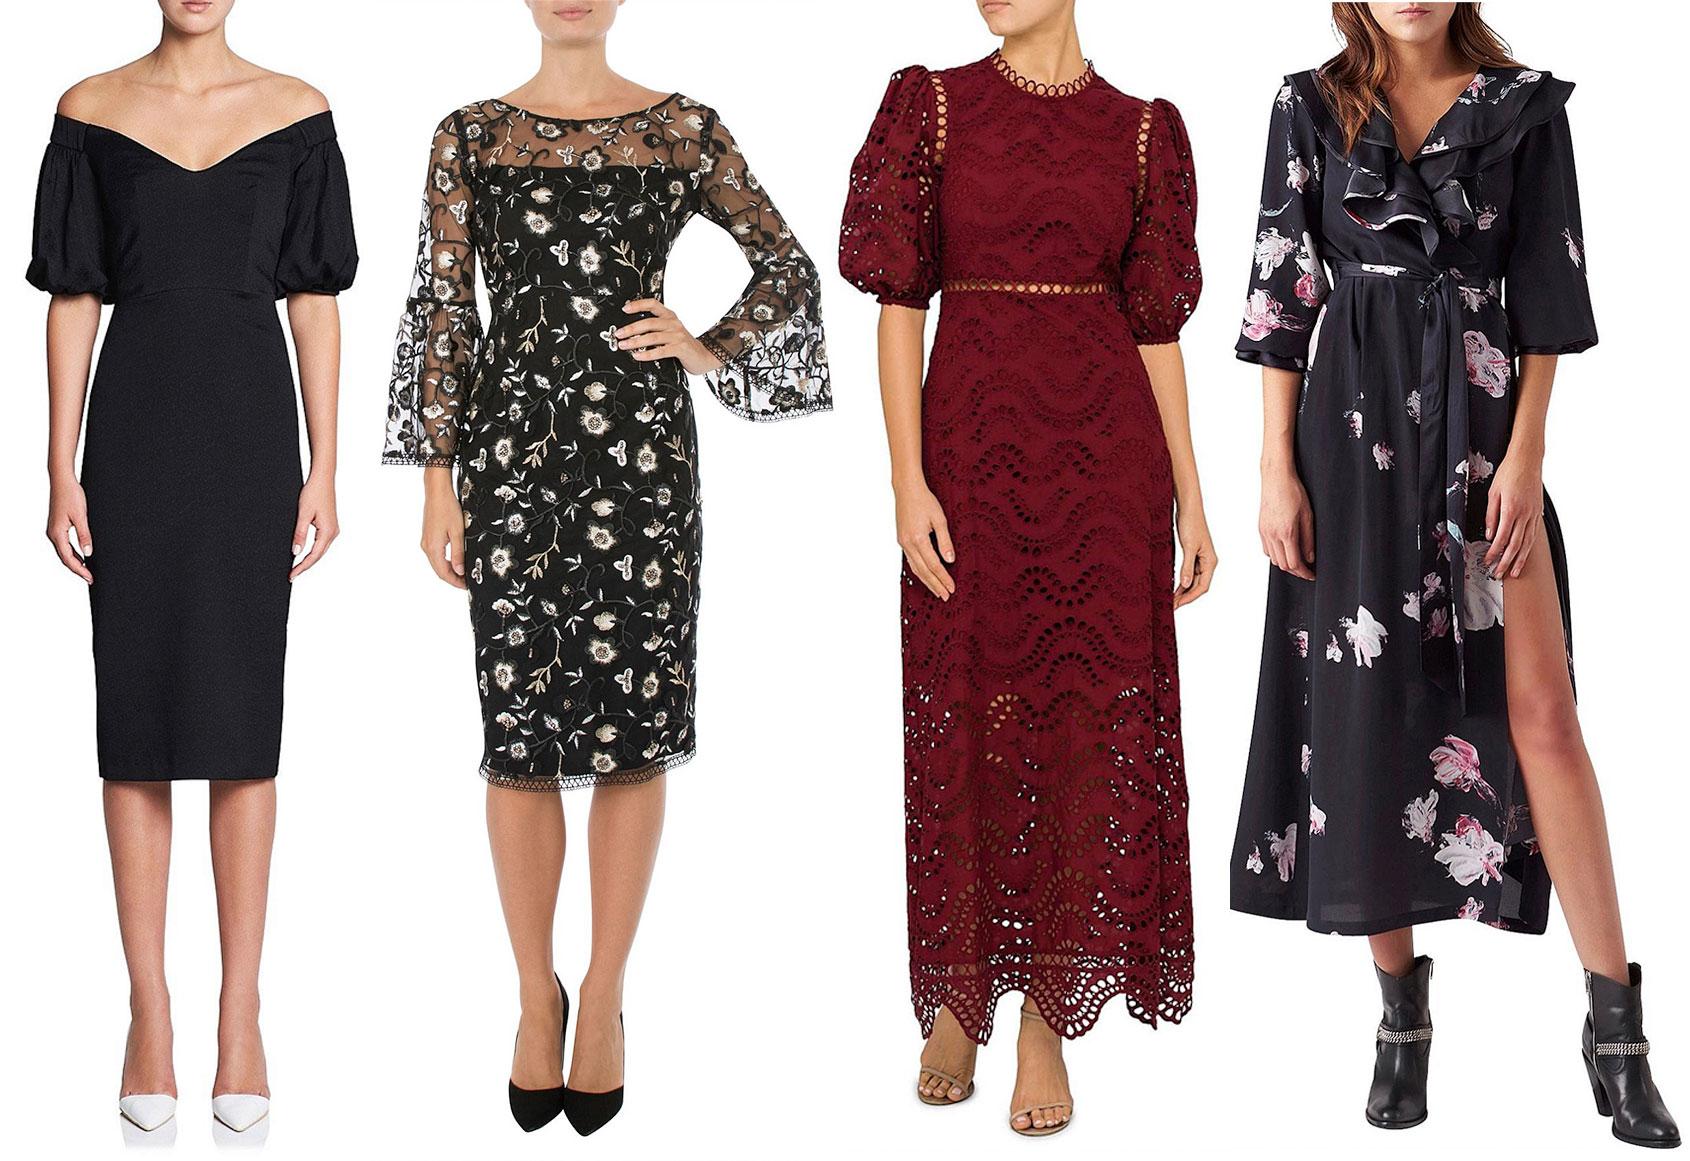 Royal Wedding 2018 Guests Best Dresses & Fashion Tips | JONES